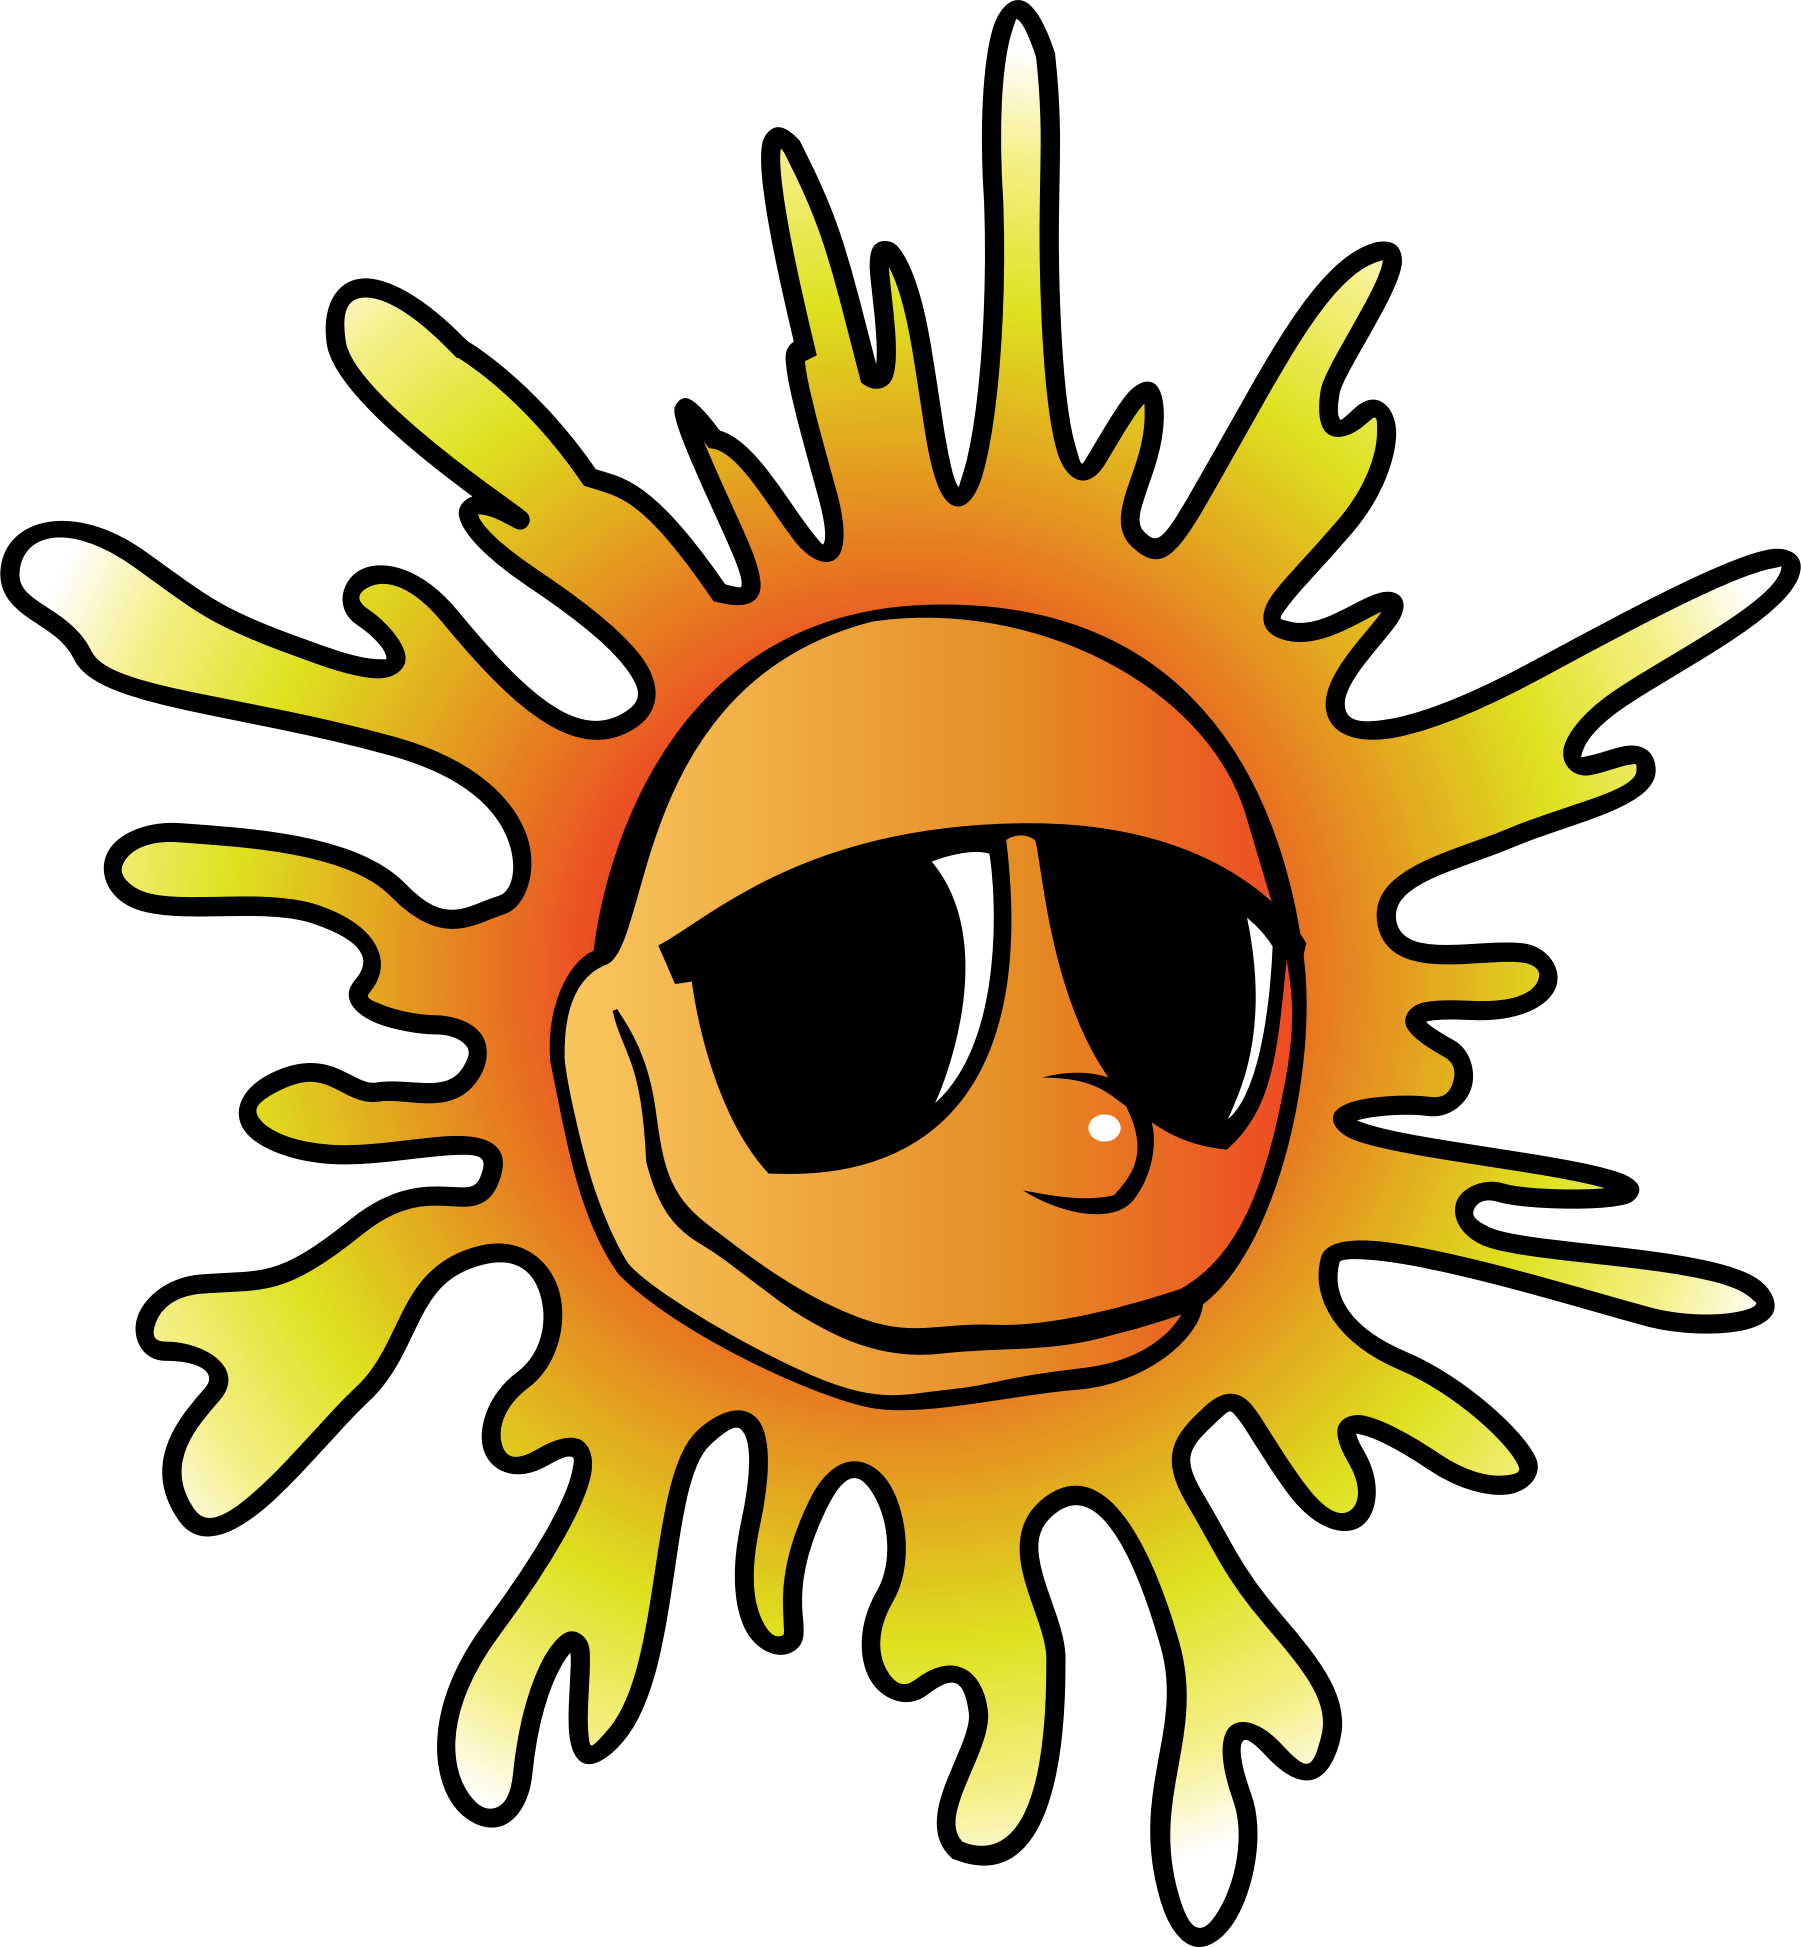 Heat clipart summer. Sunglasses big image png